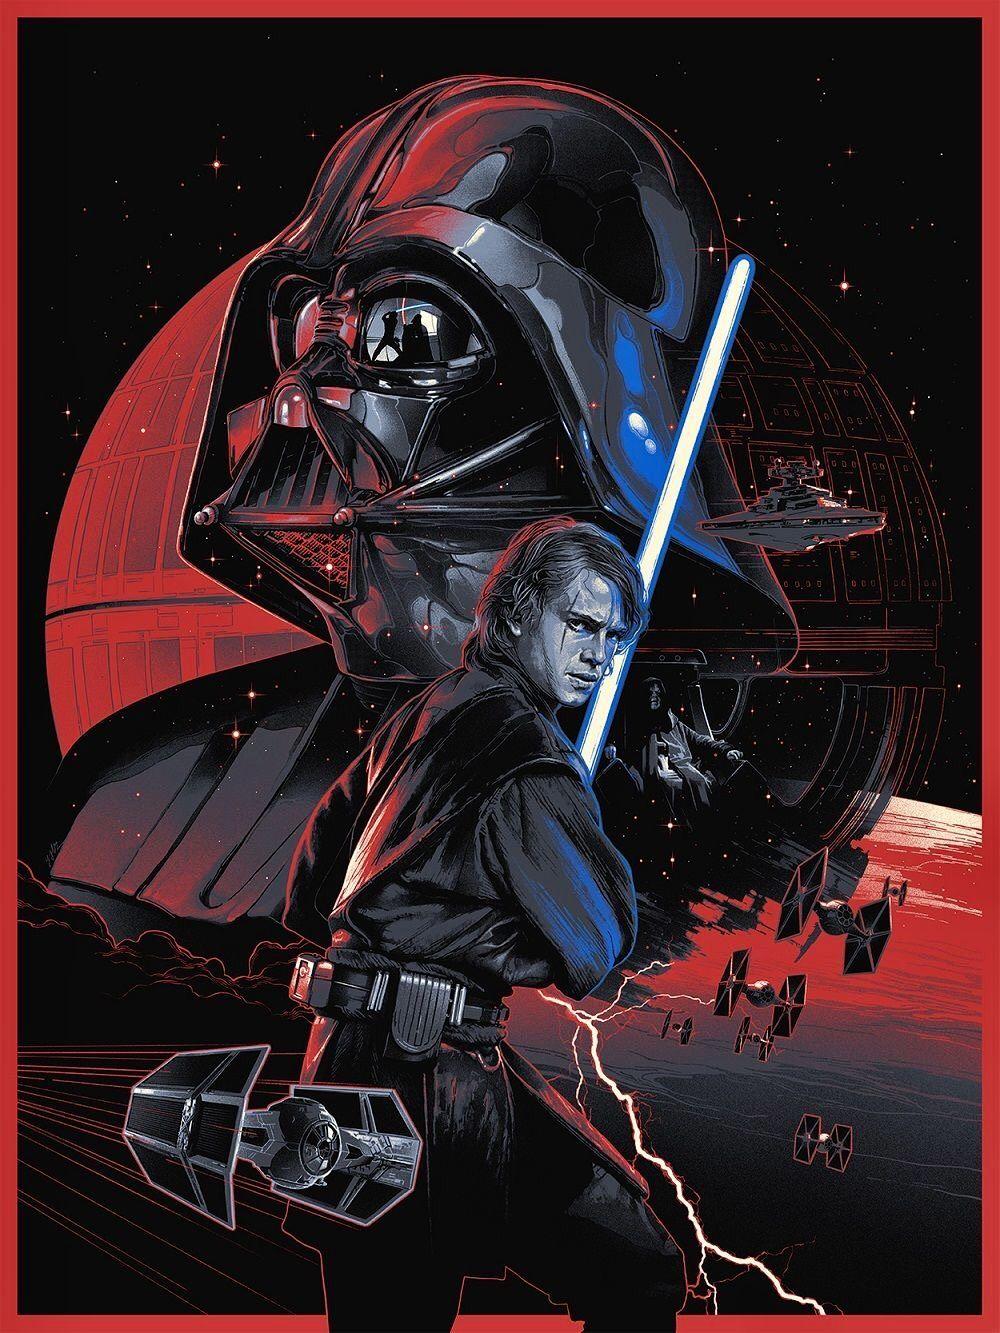 Anakin Skywalker Darth Vader Star Wars Poster Star Wars Art Star Wars Wallpaper